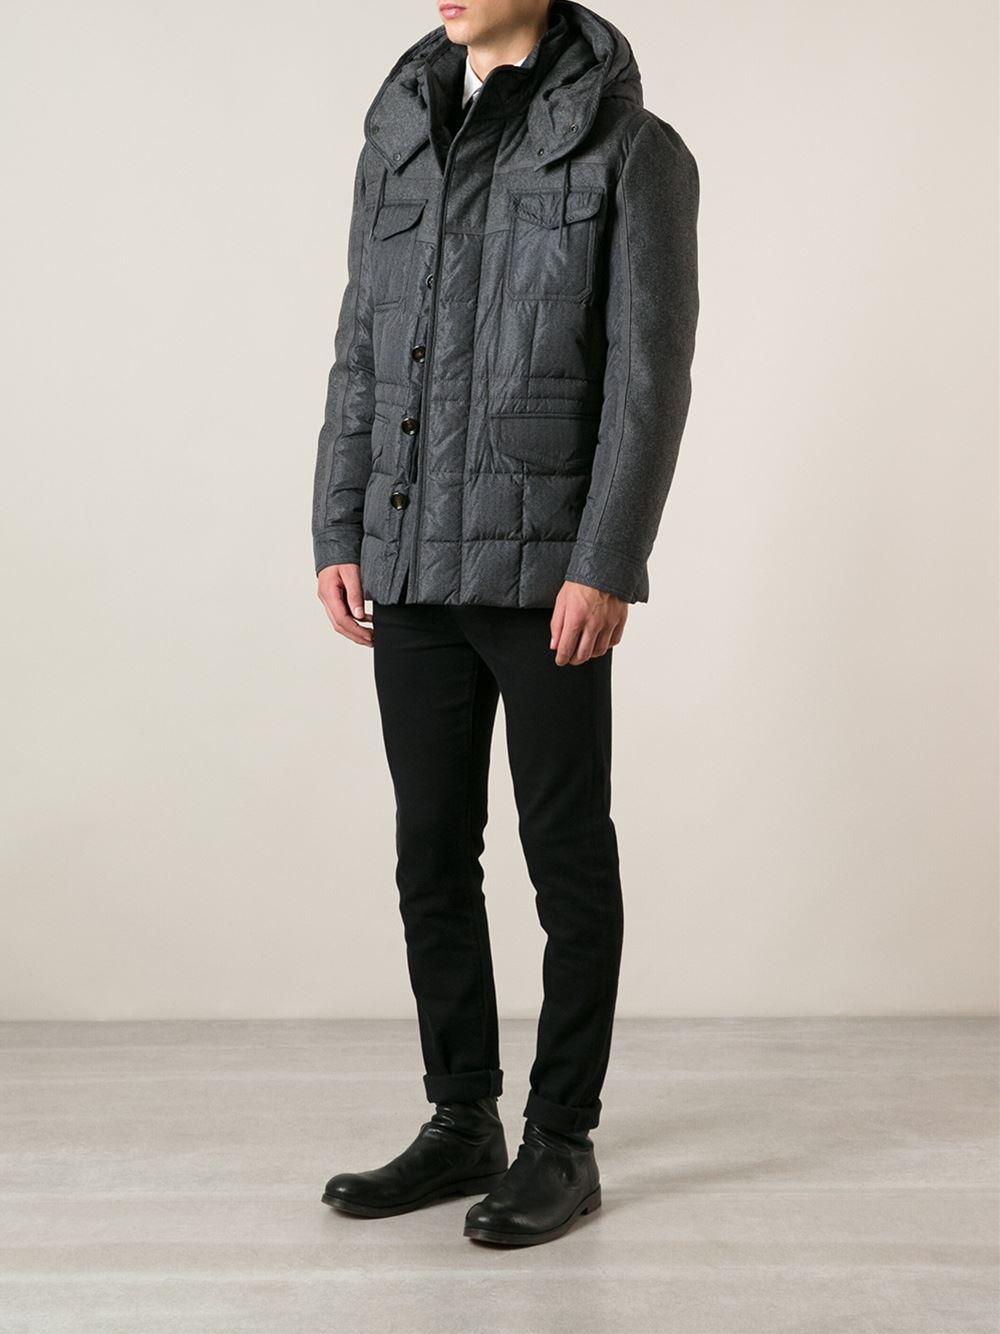 Moncler Jacob Jacket Zara Monclerclearance